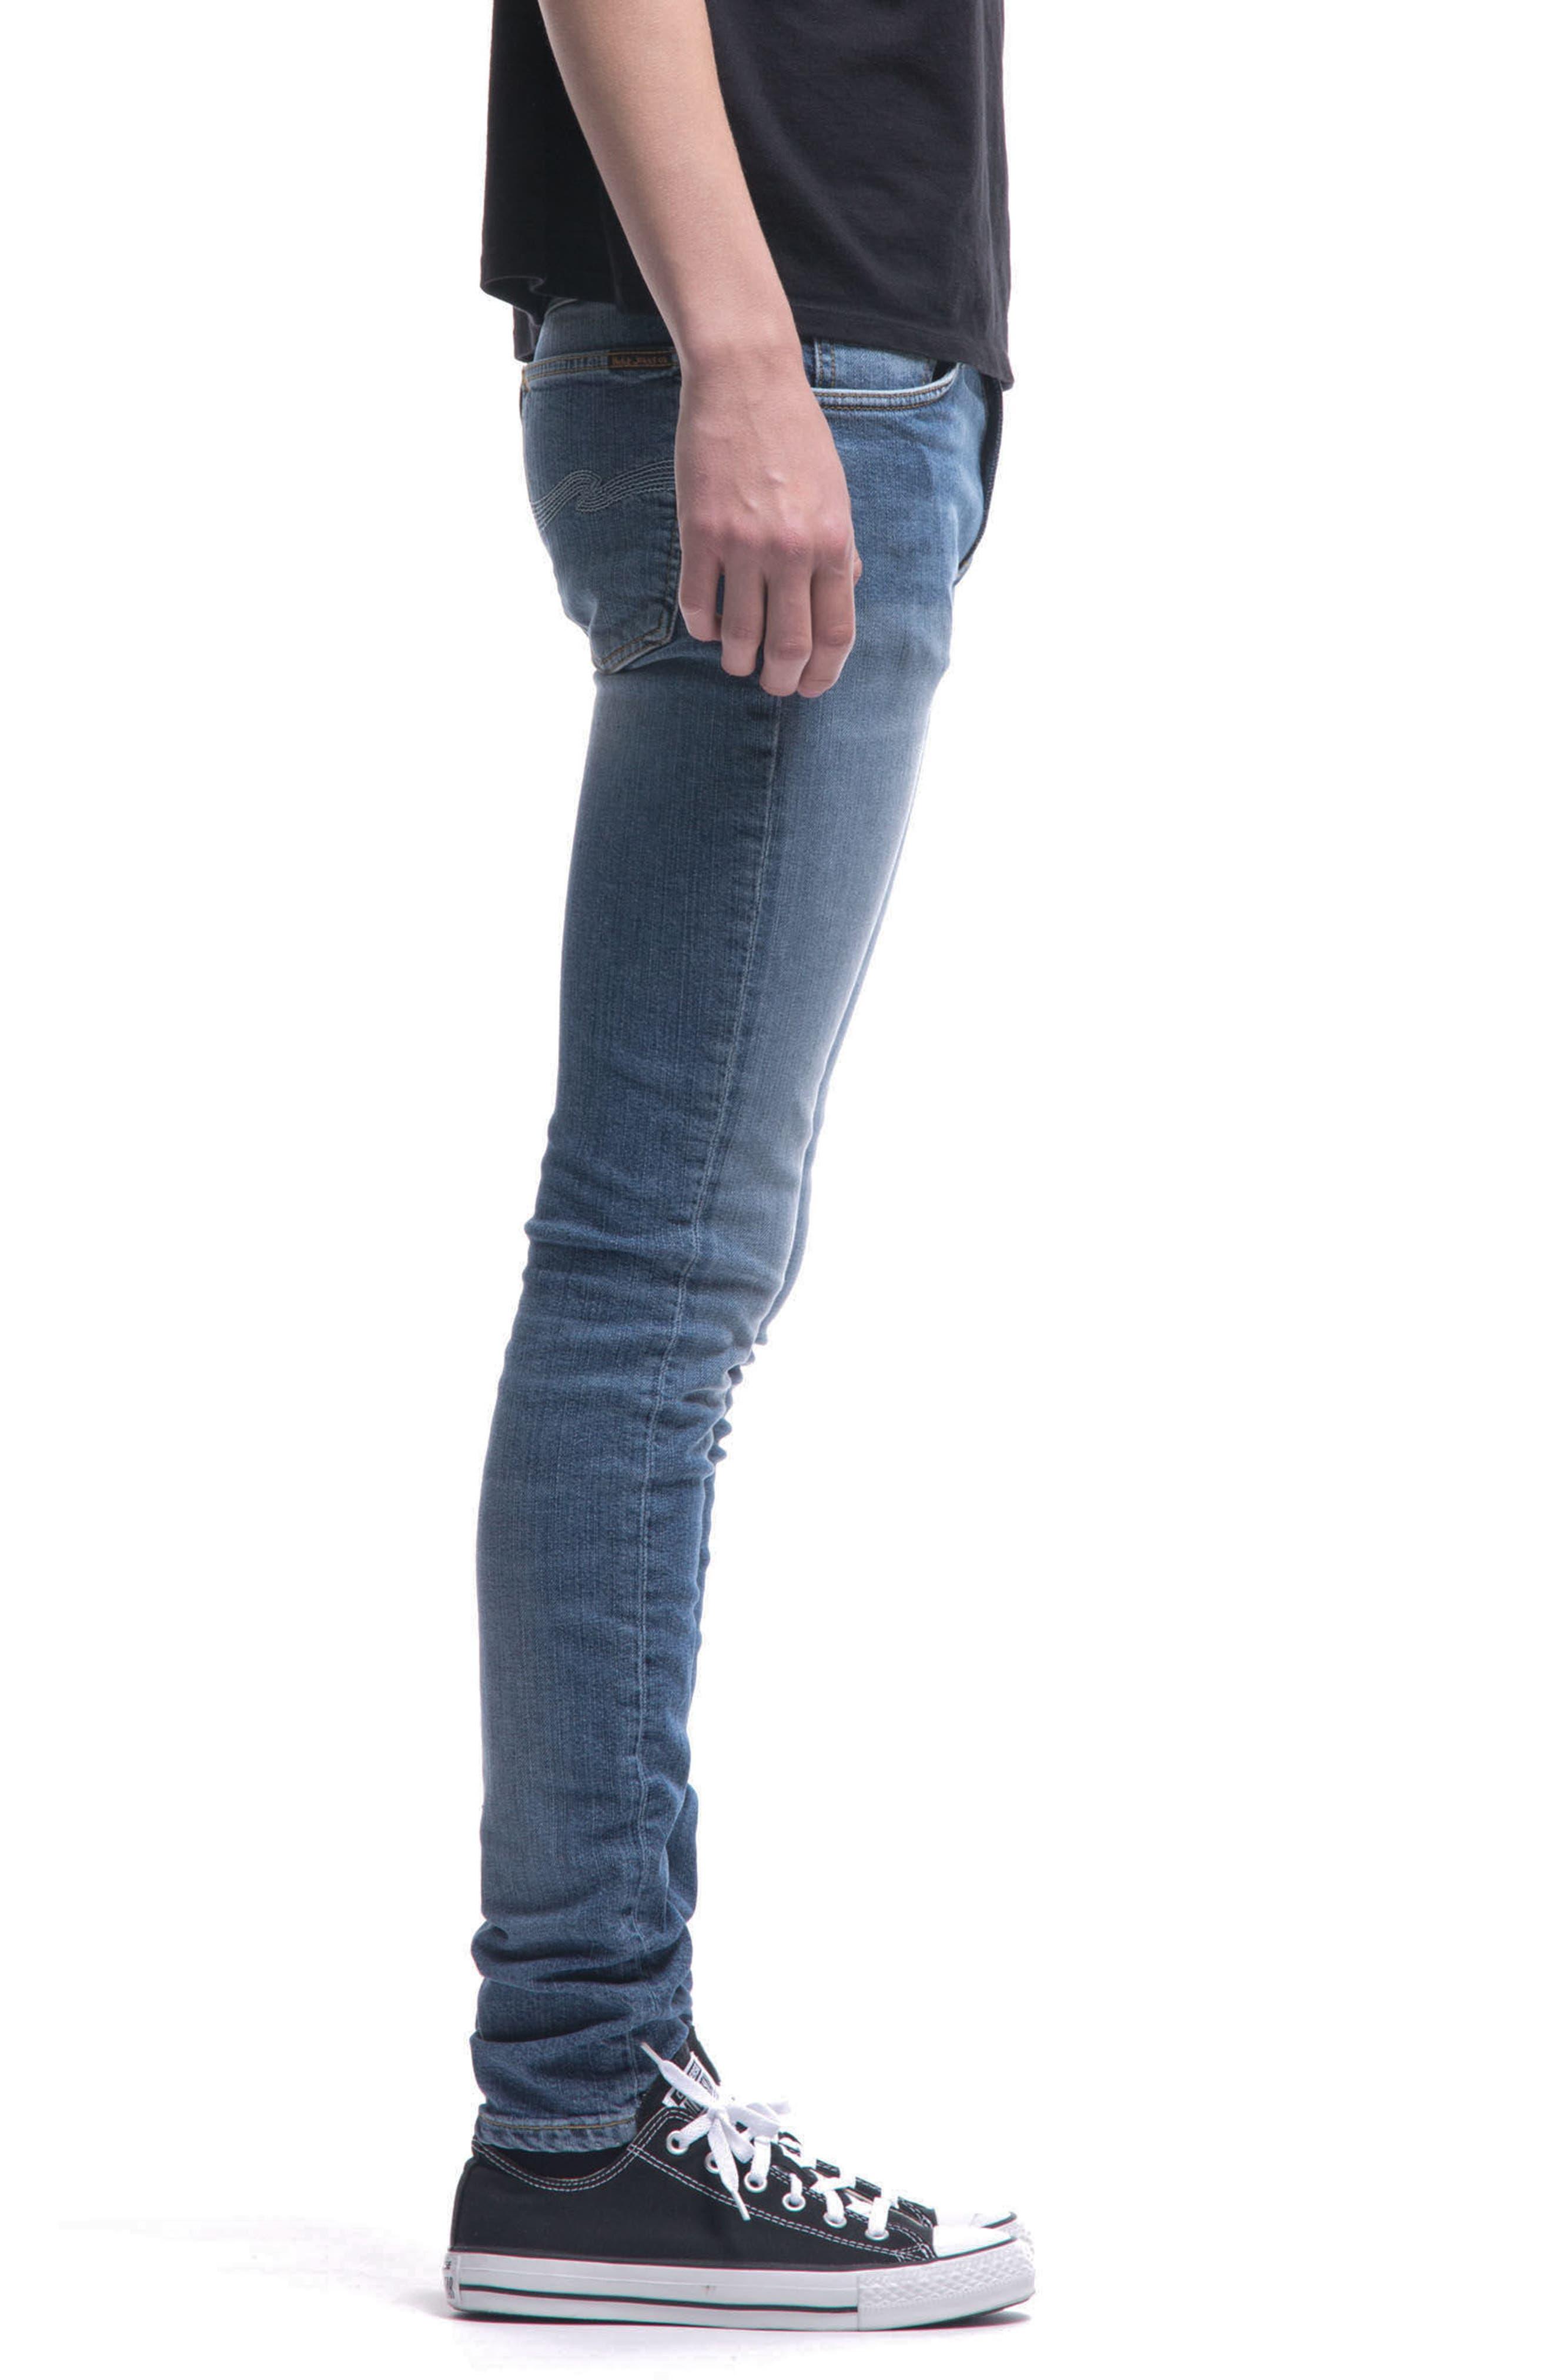 Skinny Lin Skinny Fit Jeans,                             Alternate thumbnail 2, color,                             460